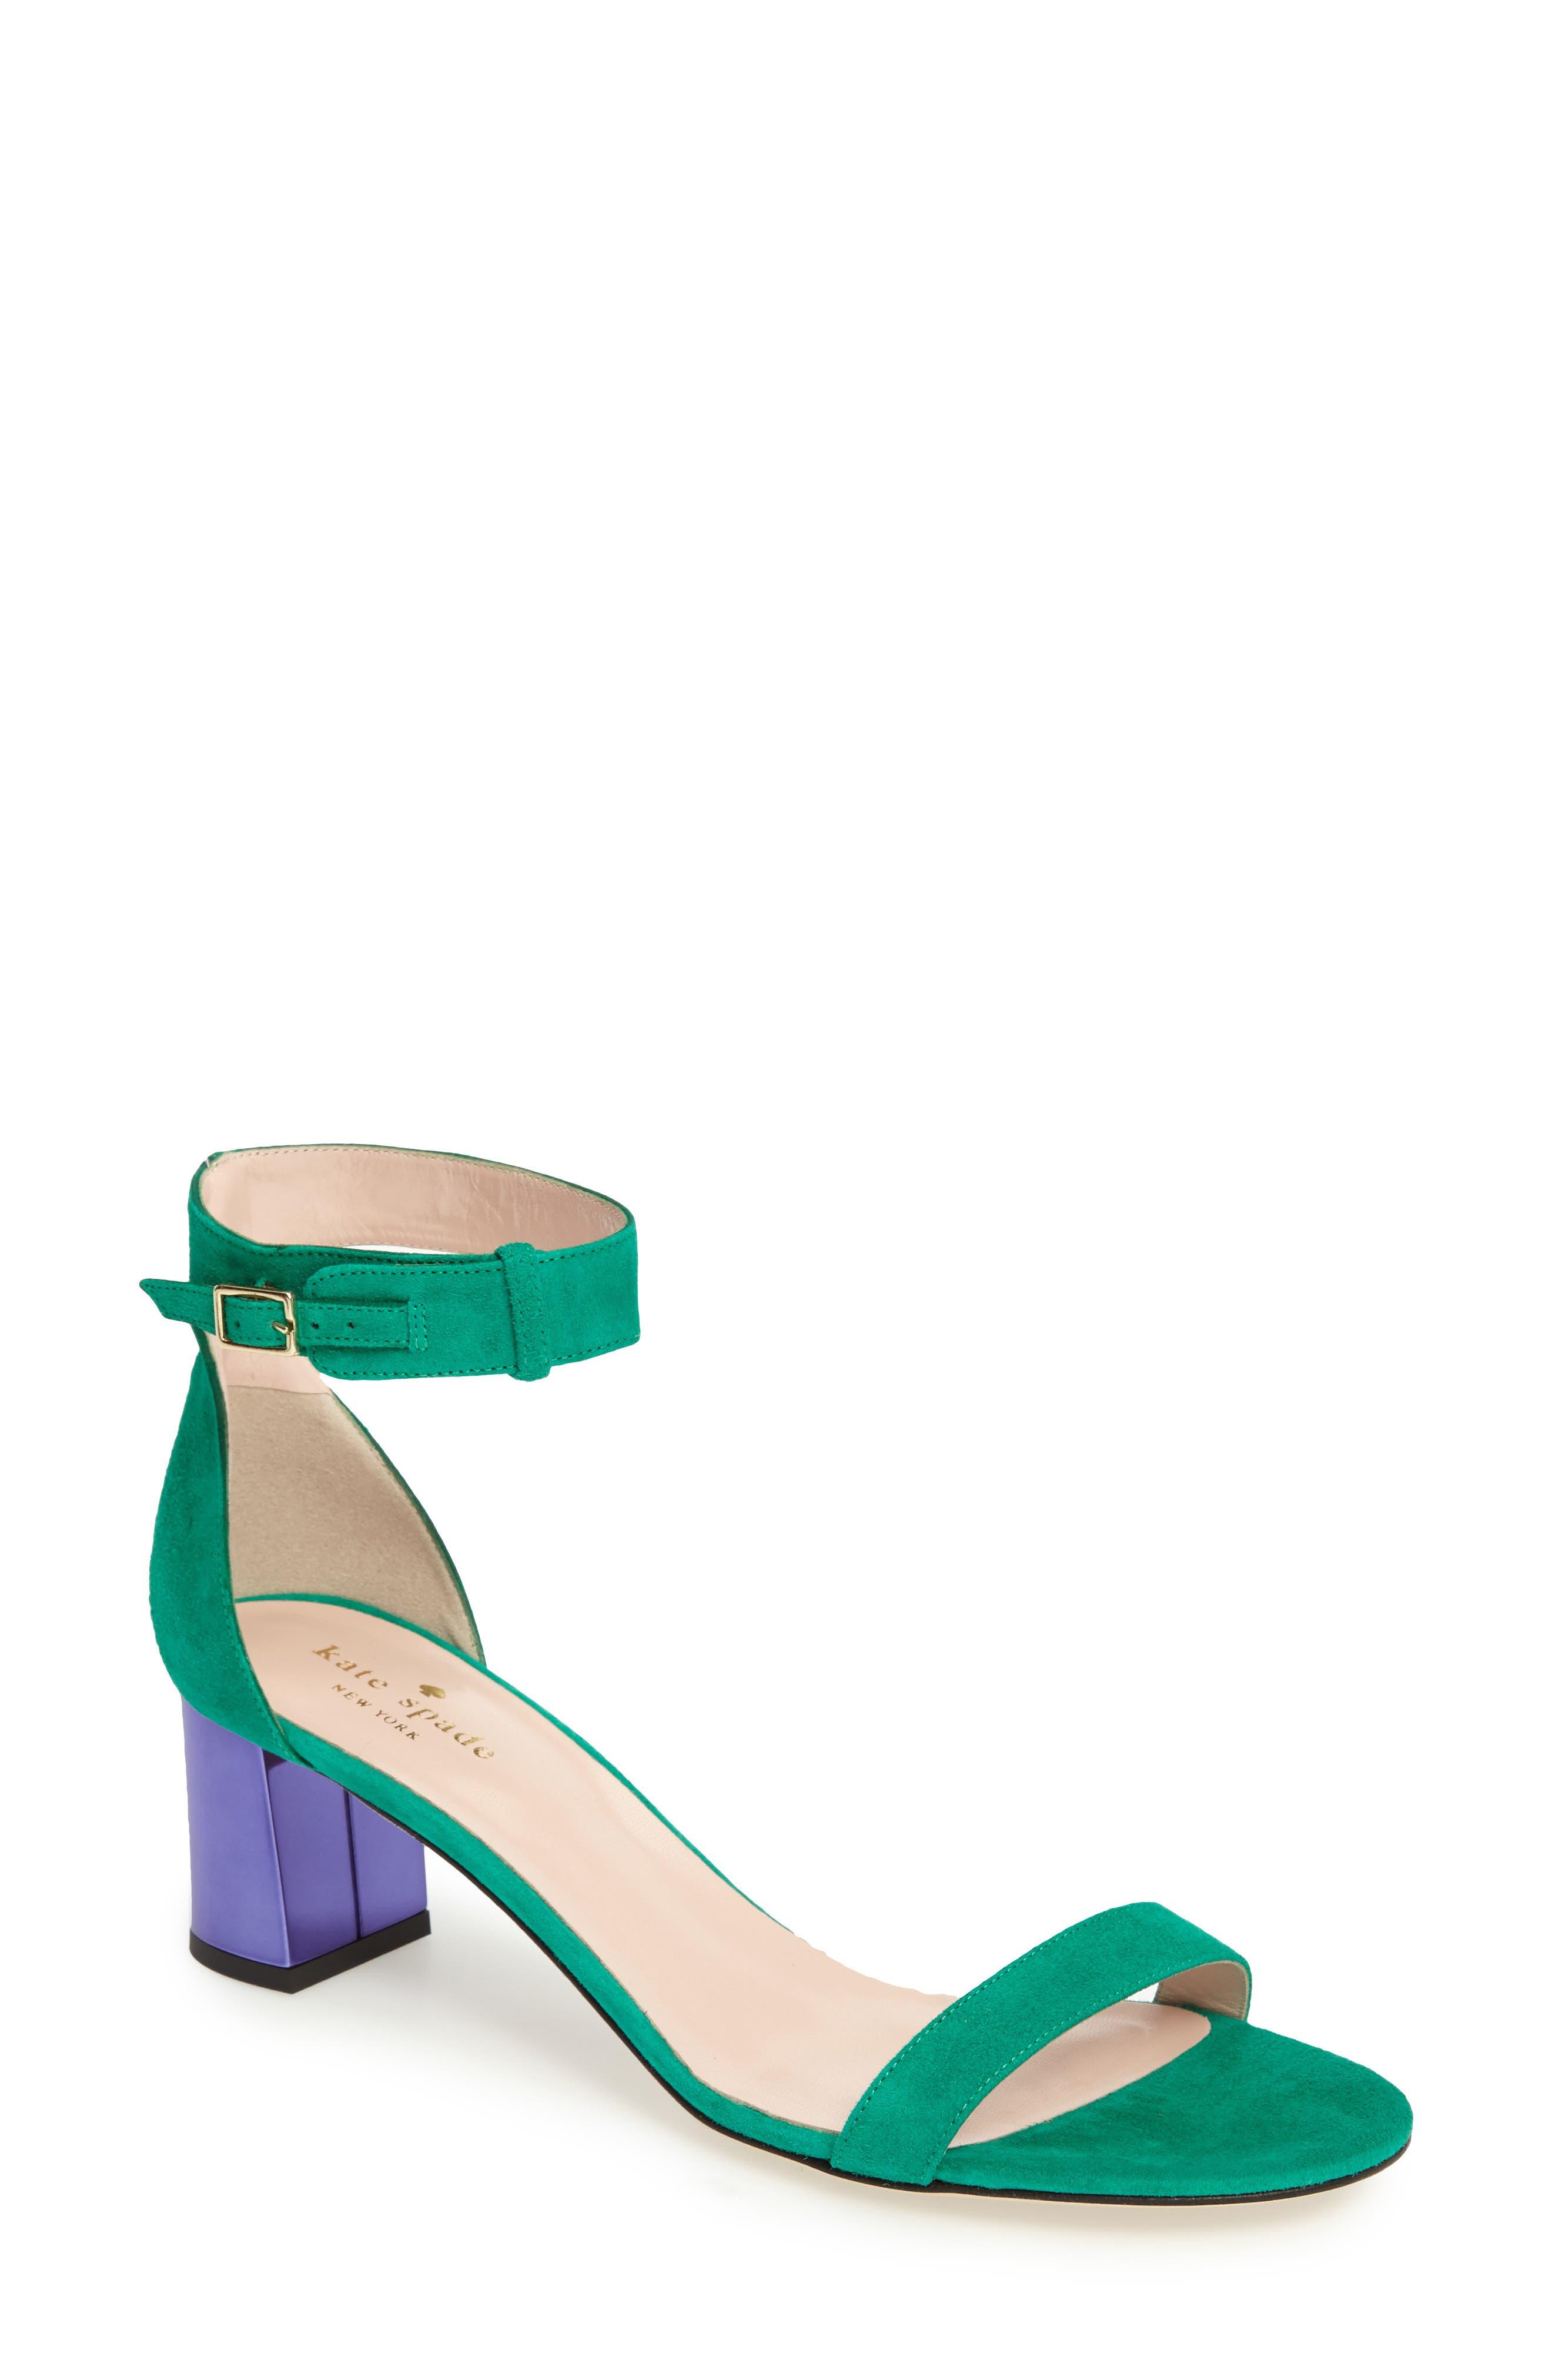 menorca ankle strap sandal,                             Main thumbnail 1, color,                             368